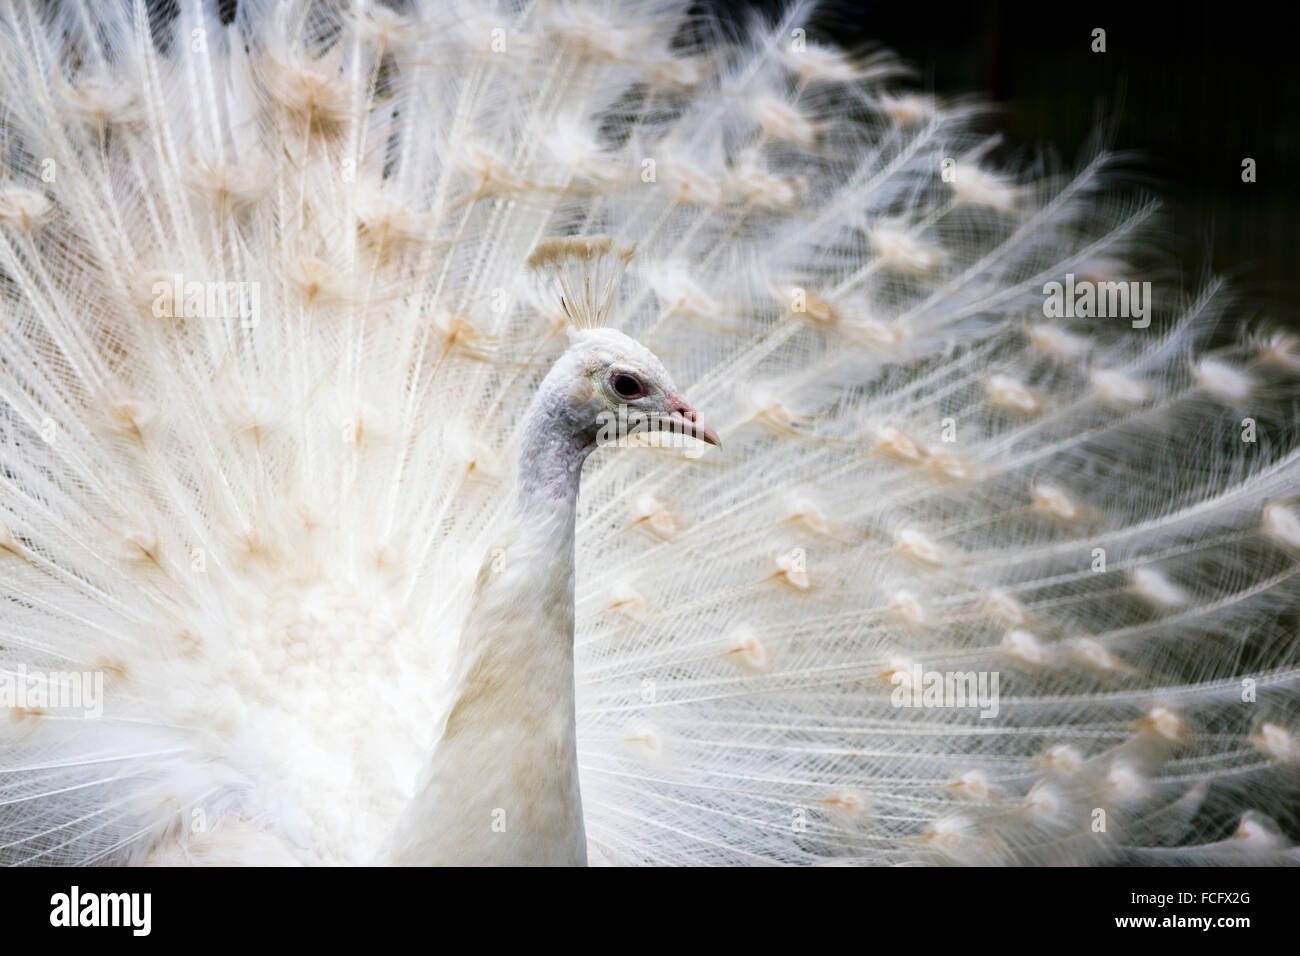 White peacock - Stock Image